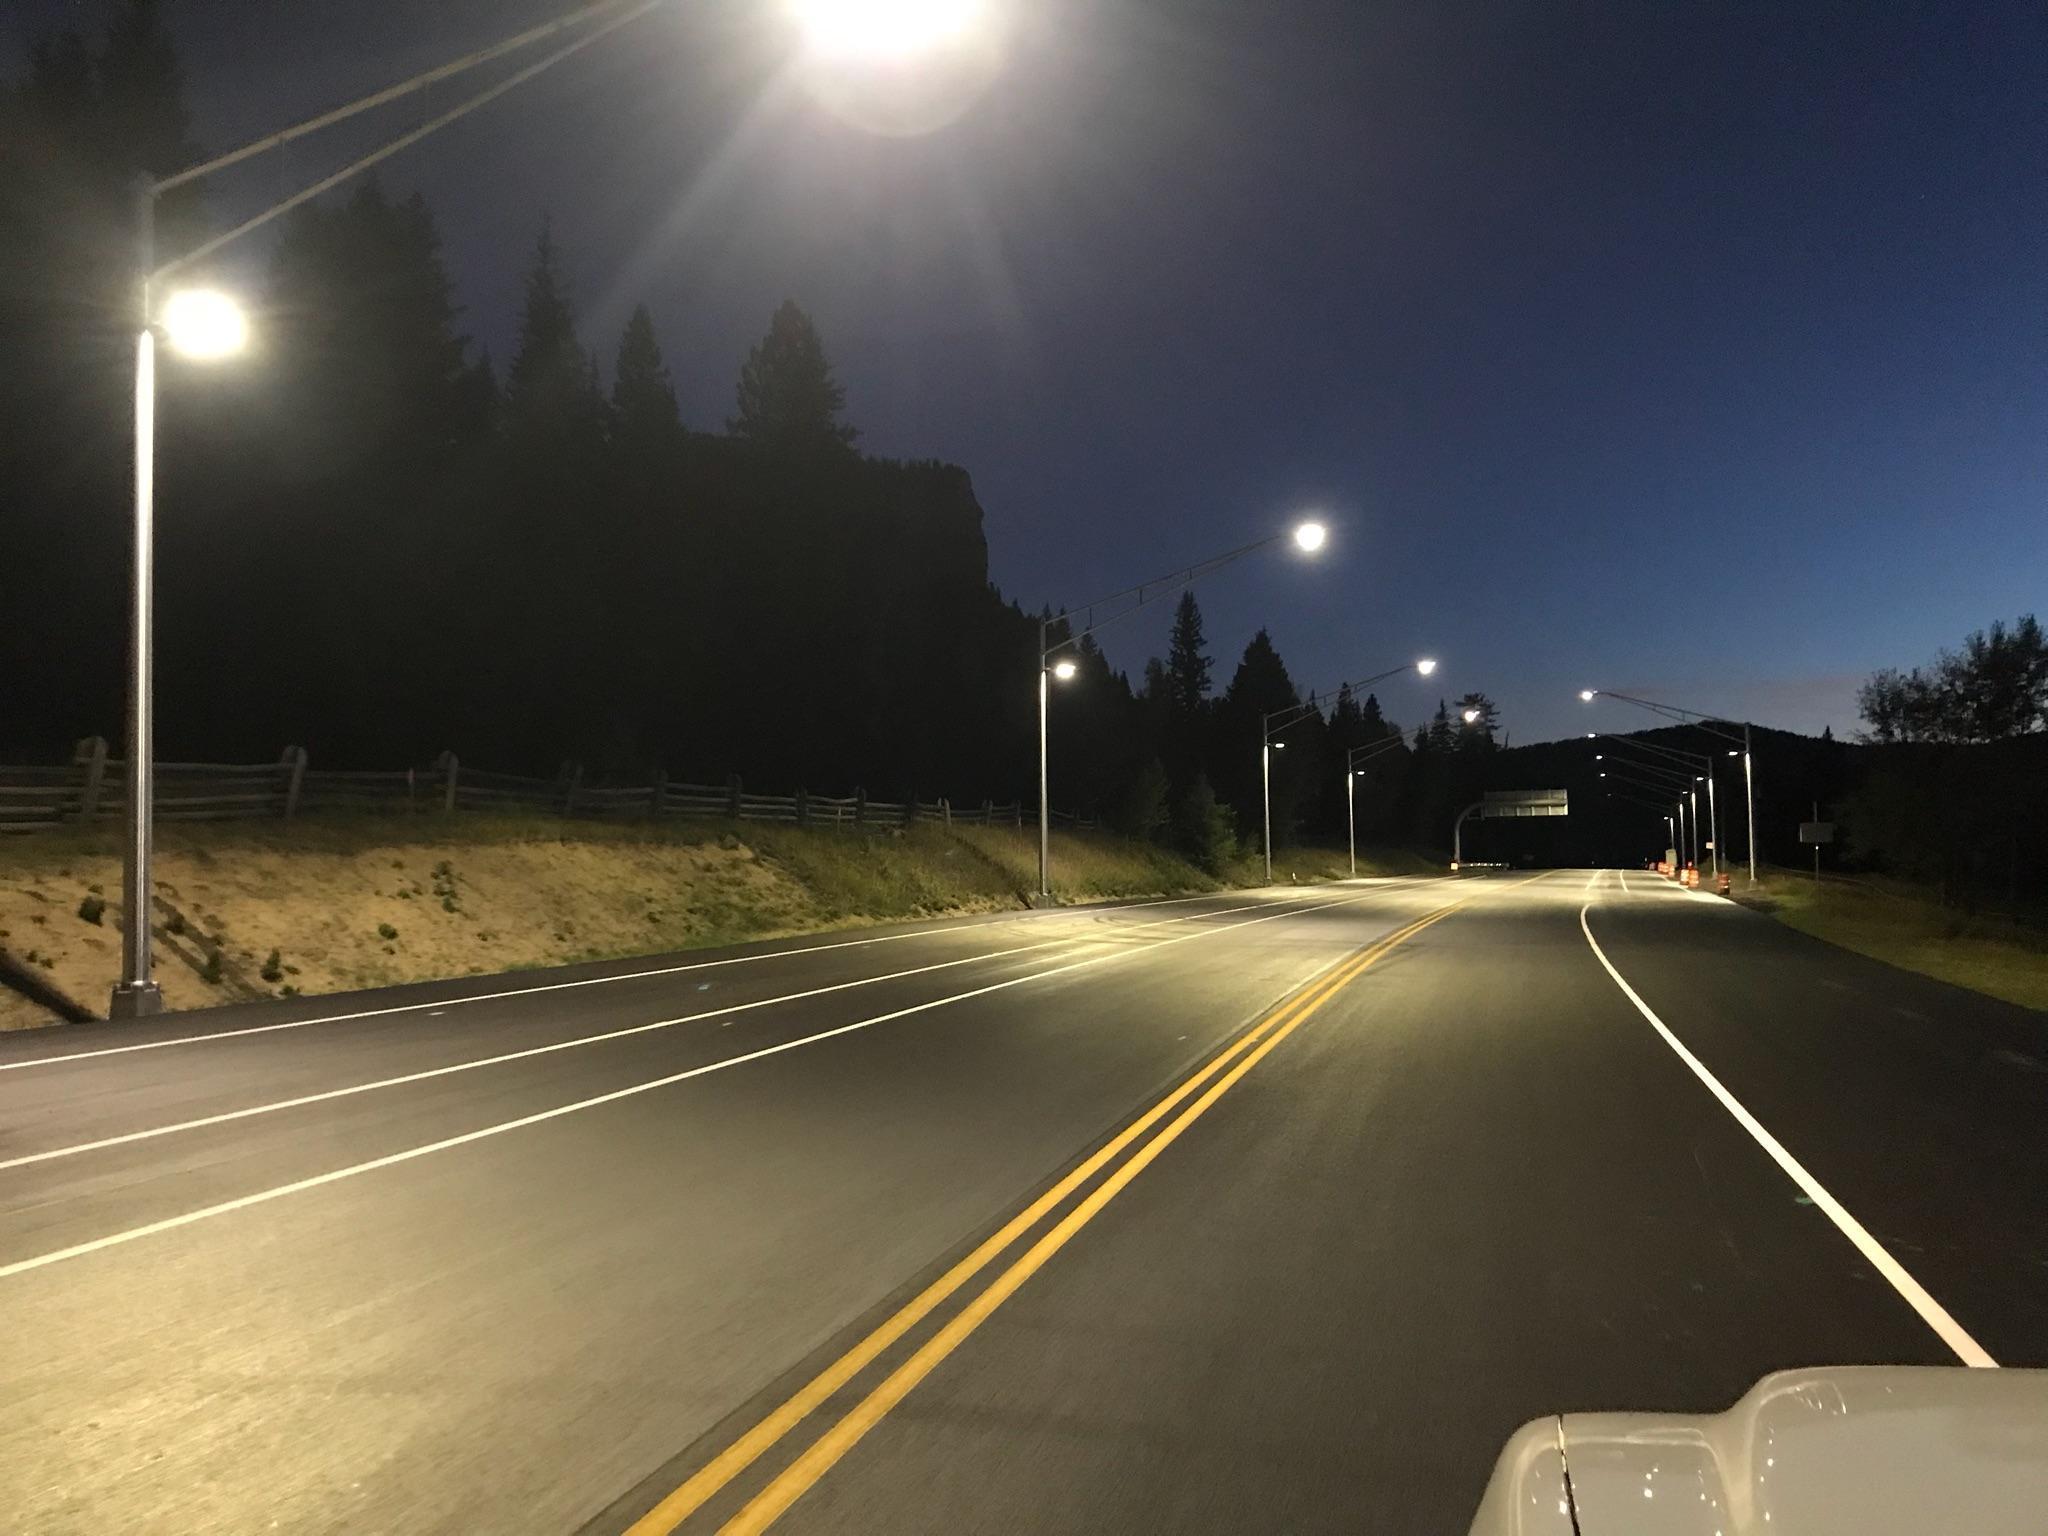 9 new luminaires on US 160.jpg detail image